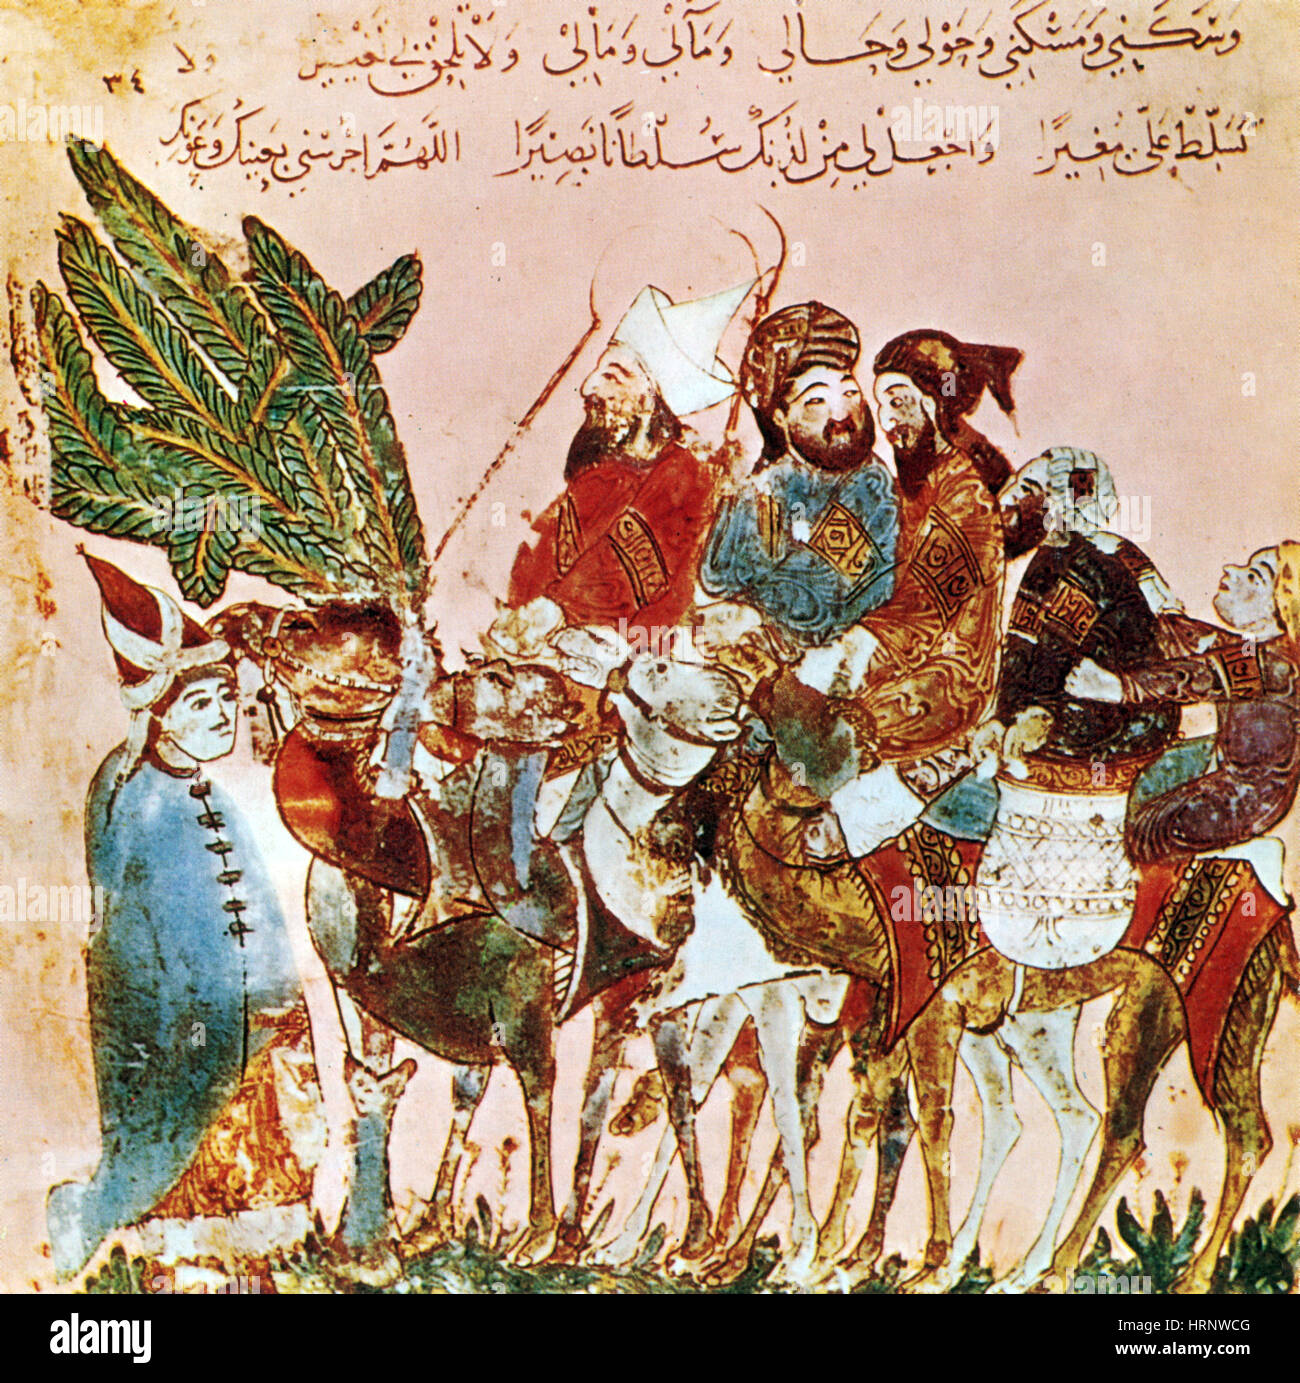 Arabic Traders, 12th-13th century - Stock Image